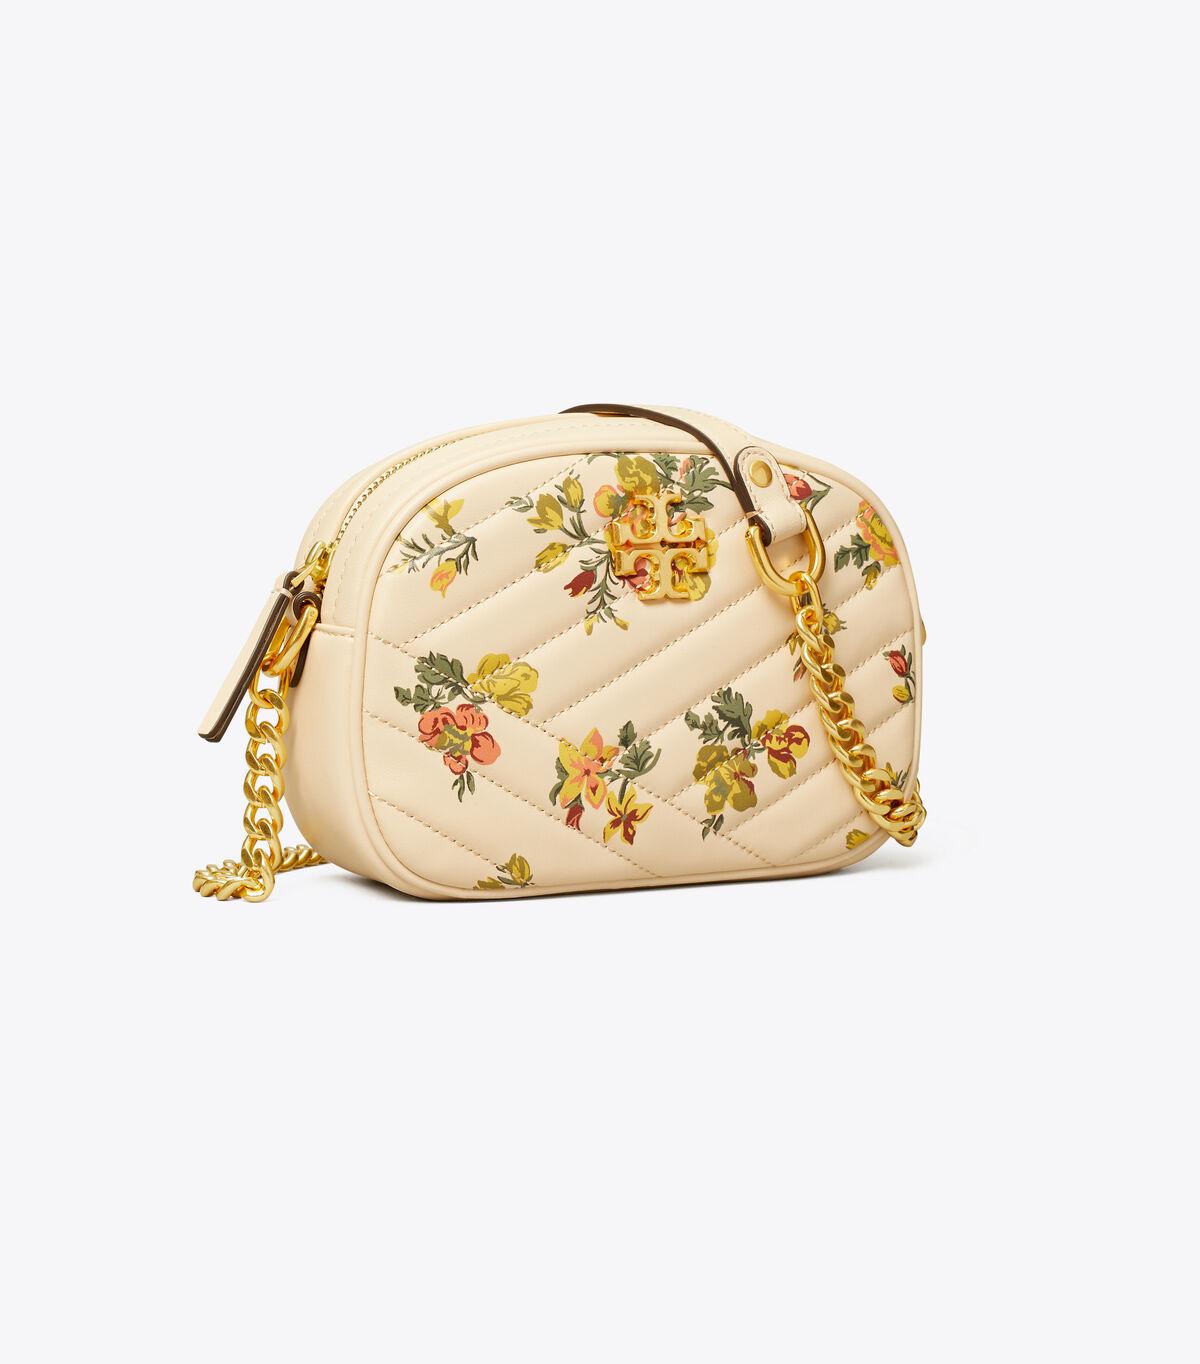 KIRA CHEVRON PRINTED SMALL CAMERA BAG